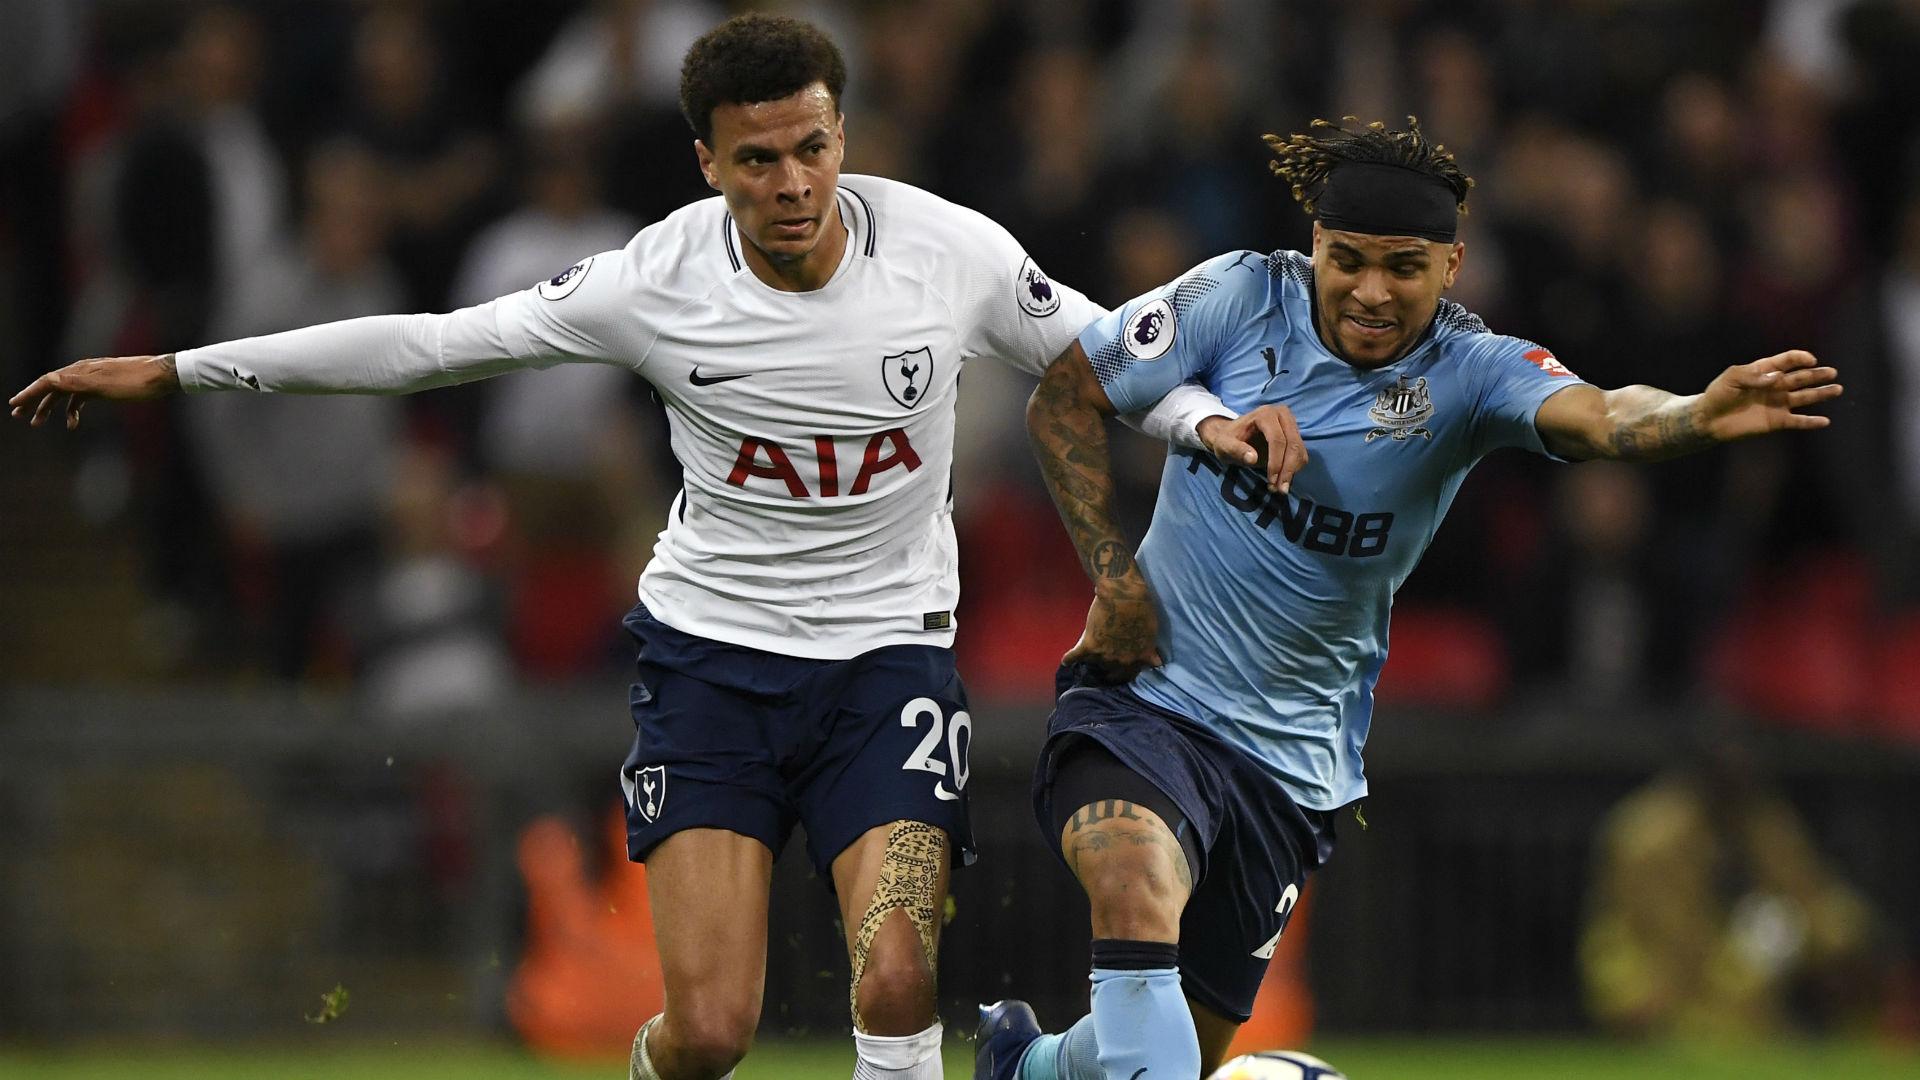 Dele Alli DeAndre Yedlin Tottenham Newcastle Premier League 2018